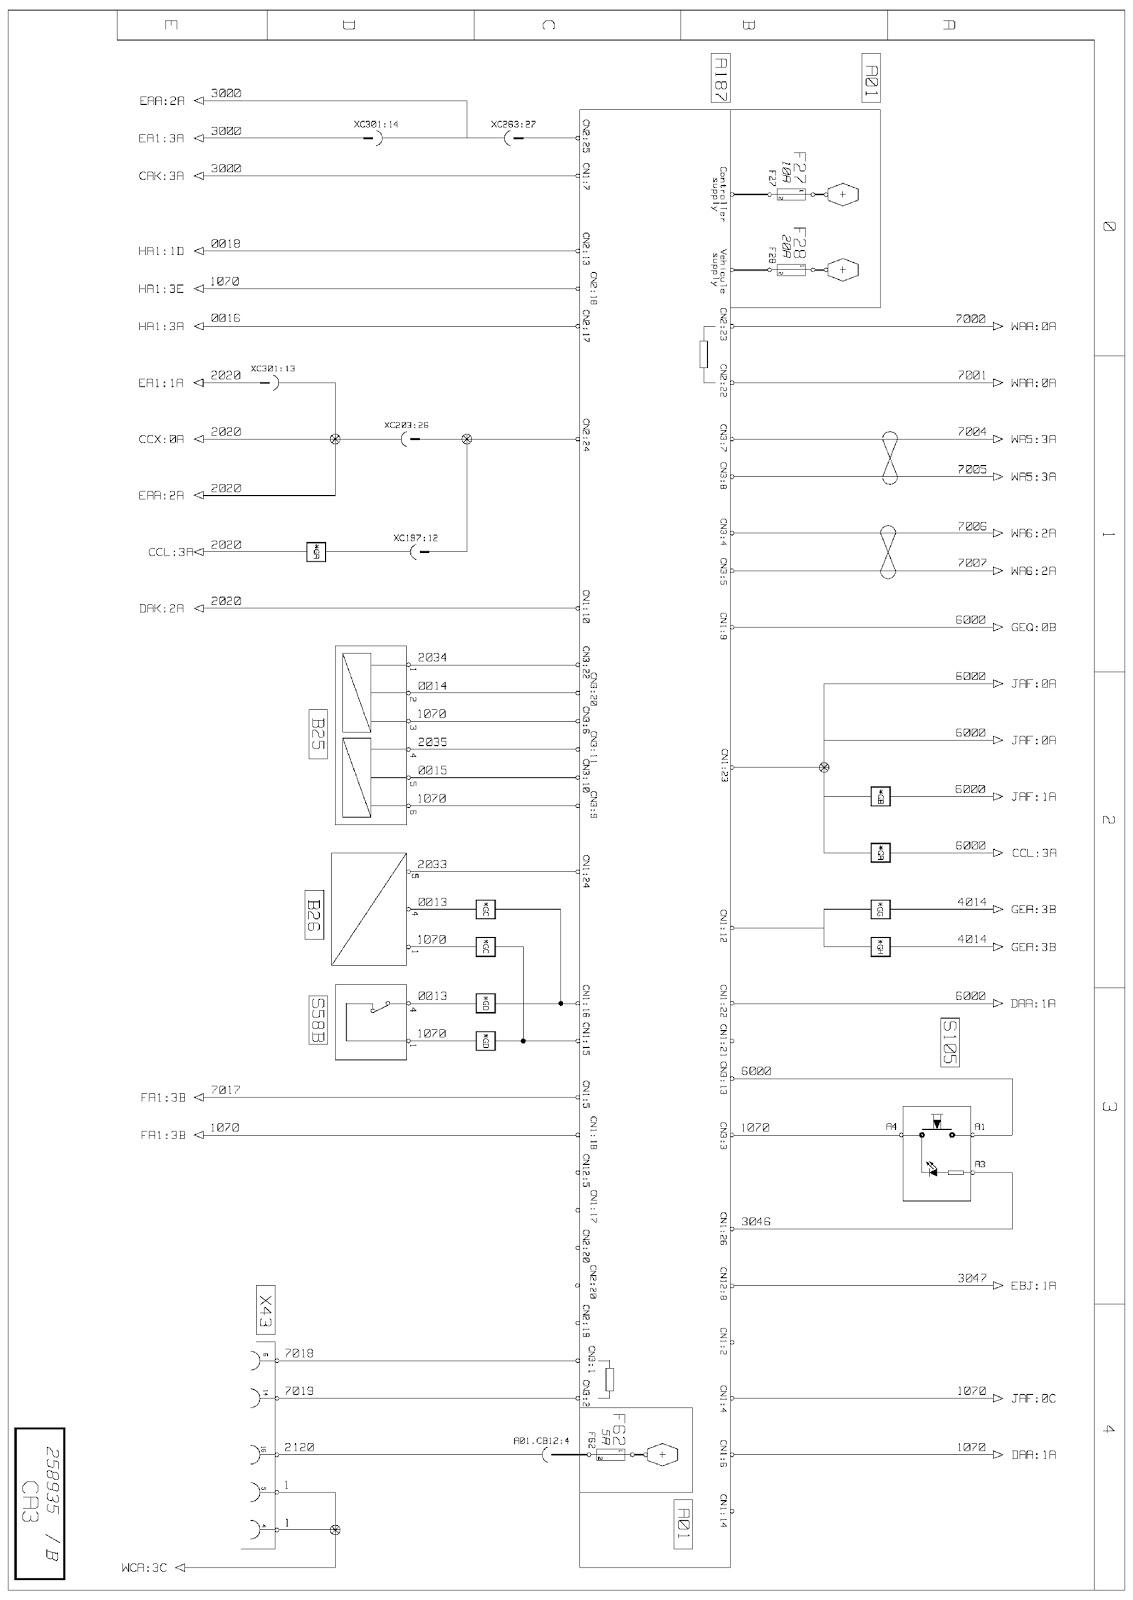 Renault Truck Wiring Diagram Electrical House 2016 Dodge Ram 7 Pin Trailer Diagrams Trucks T Euro Vi Rh Euro6 Blogspot Com Pickup Chevy